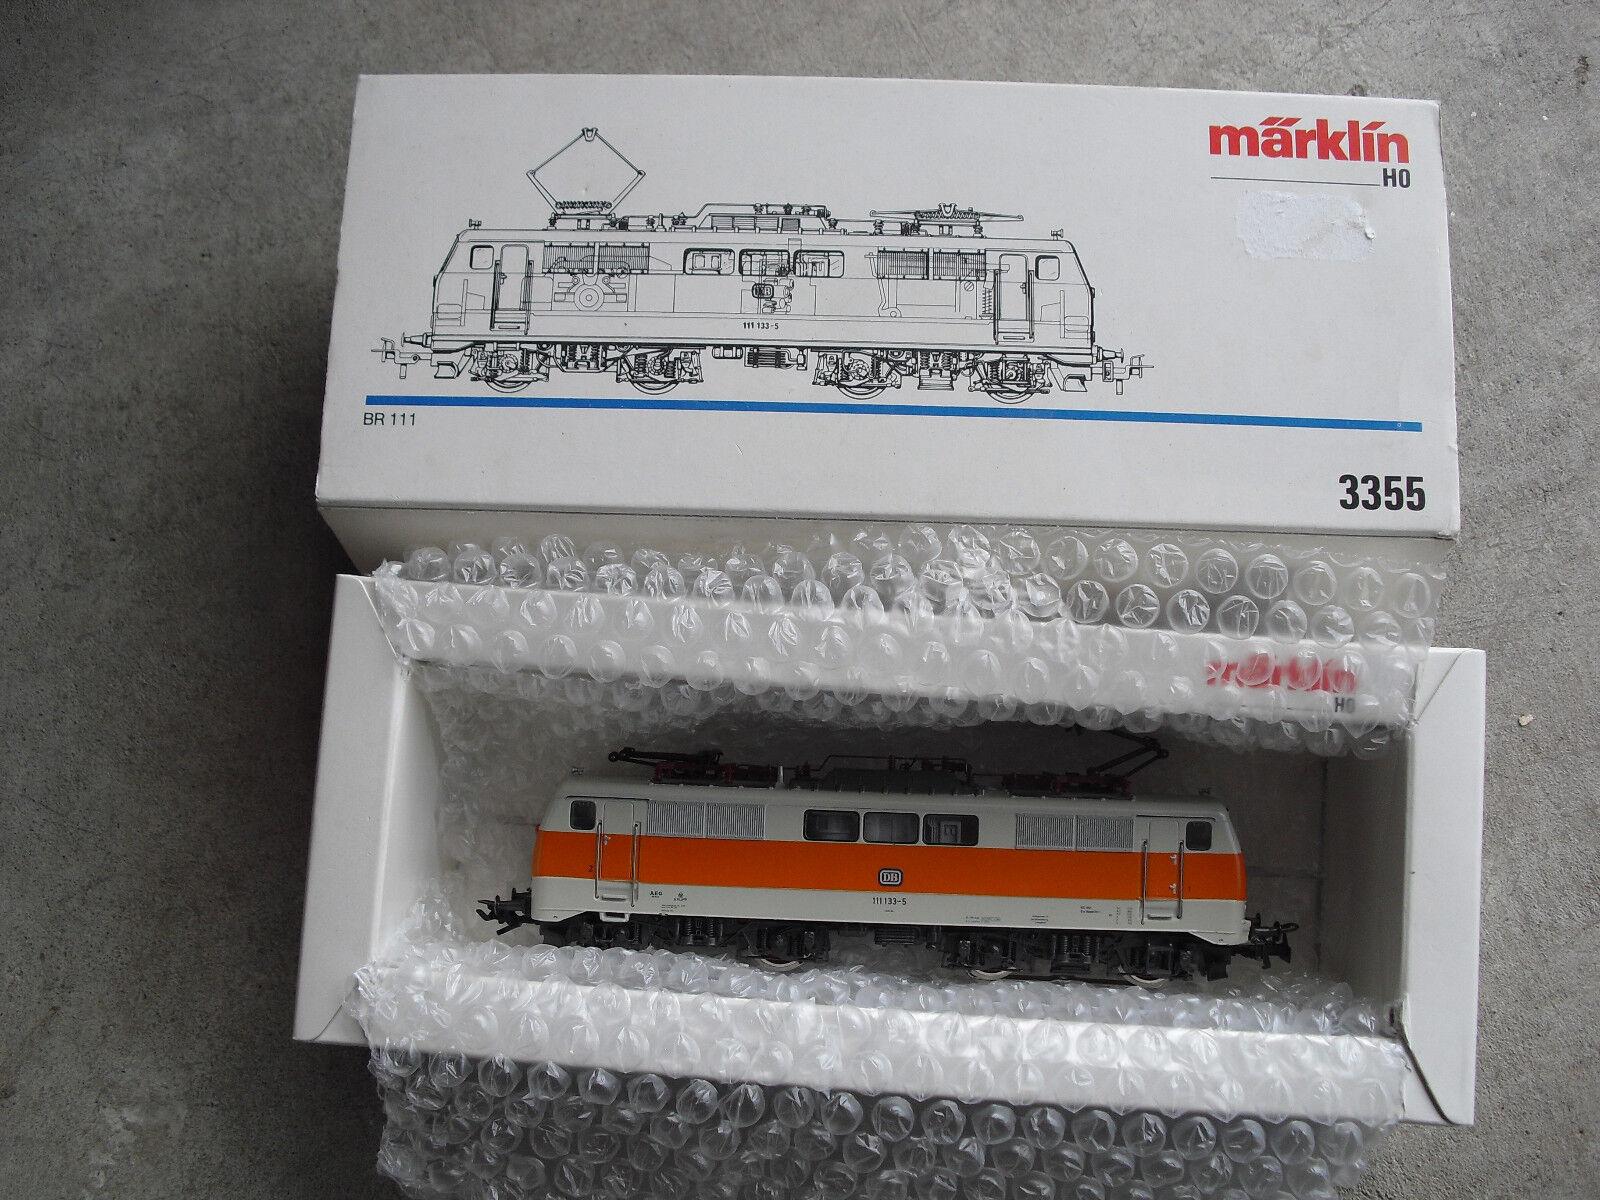 Marklin HO Scale DB 111 133-5 Electric DB Locomotive in Box 3355